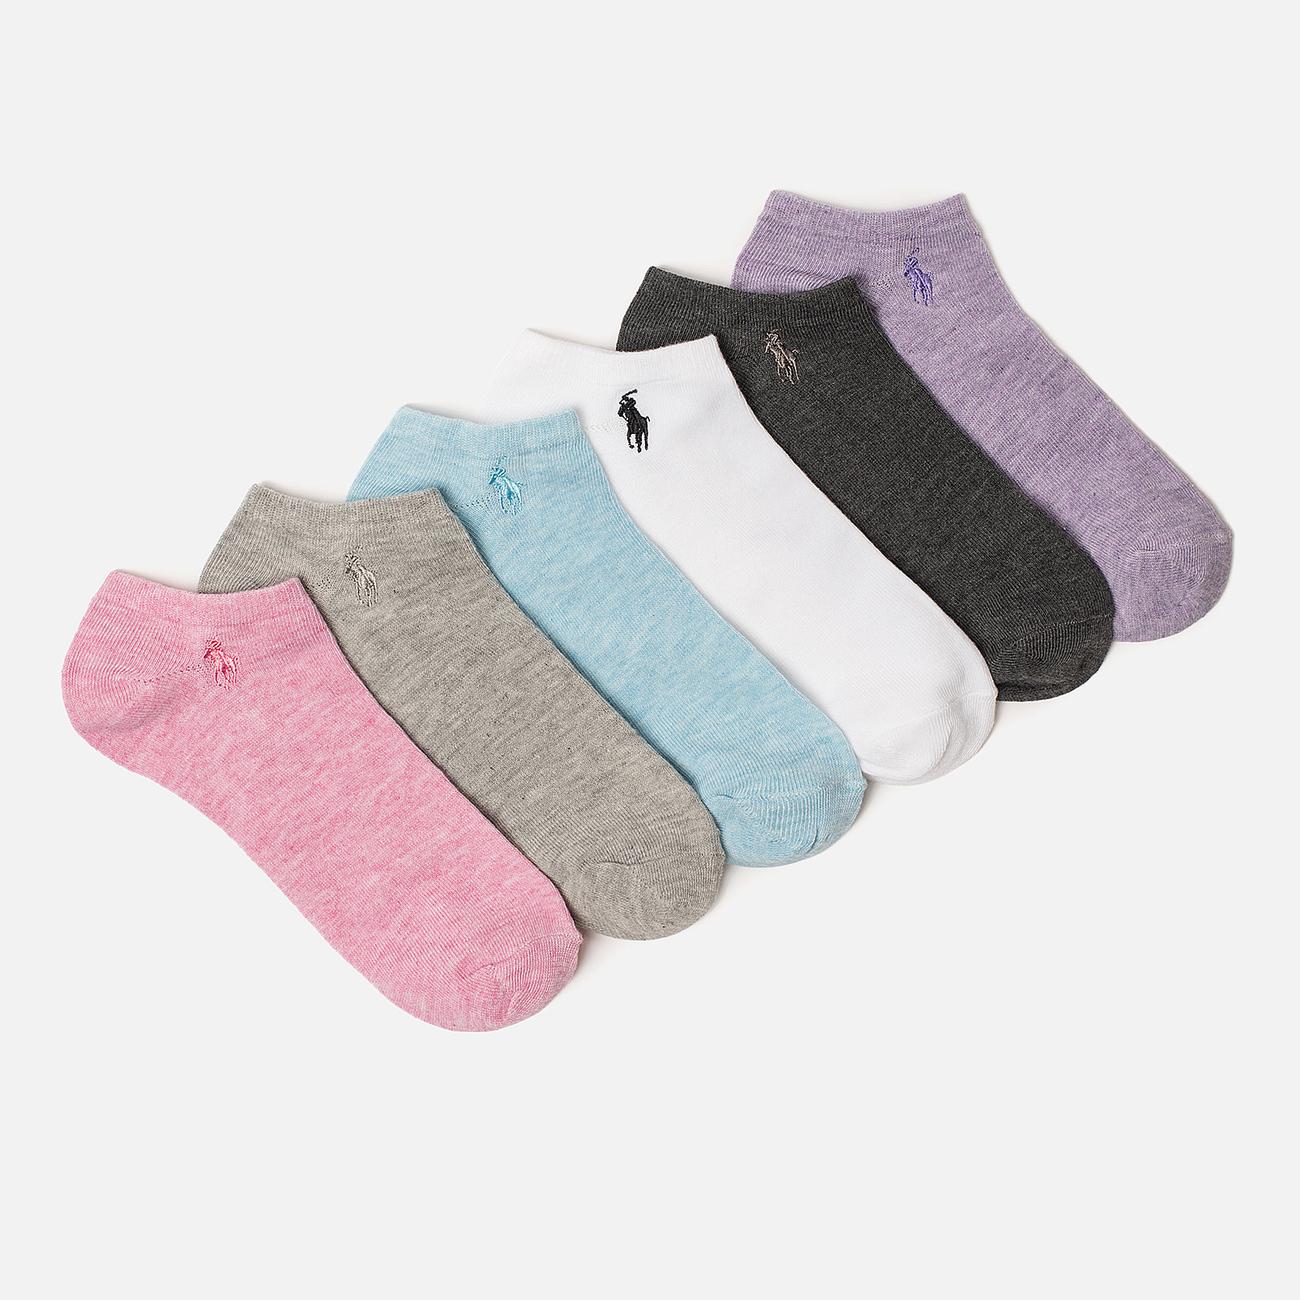 Комплект женских носков Polo Ralph Lauren Flat Ultra 6-Pack Multicolor